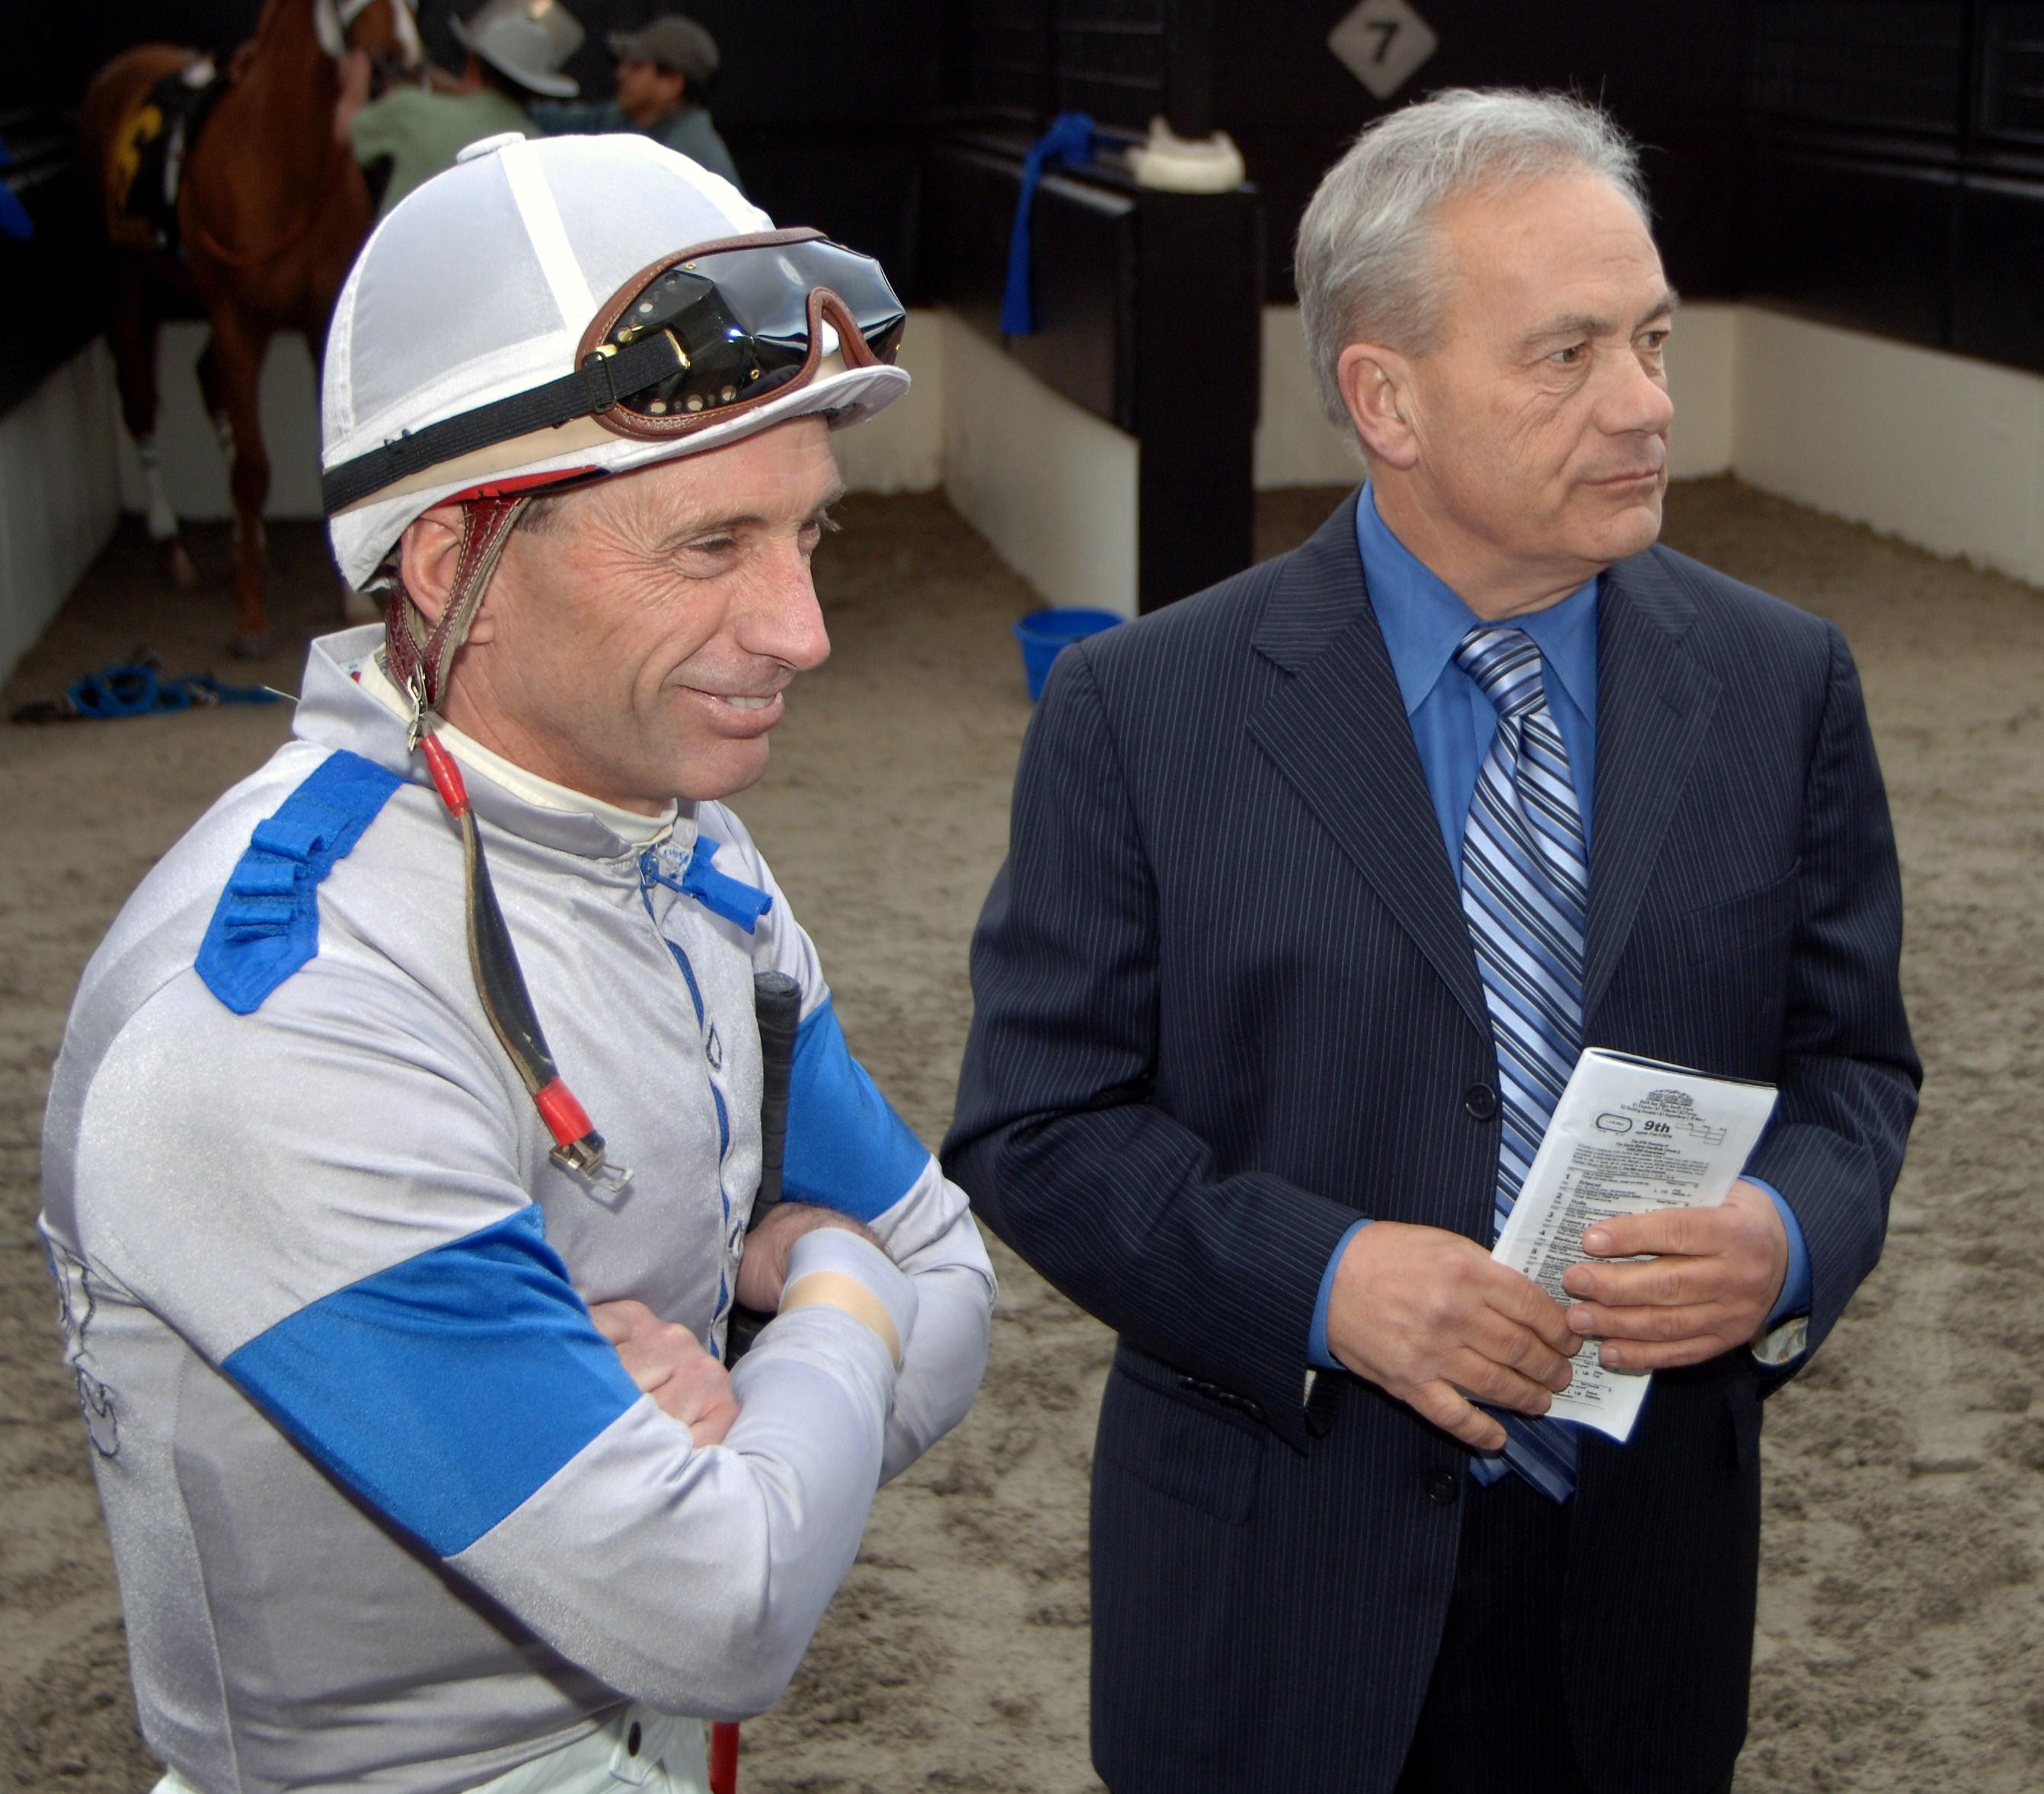 Russell Baze, left, and Jerry Hollendorfer (Benoit Photo)